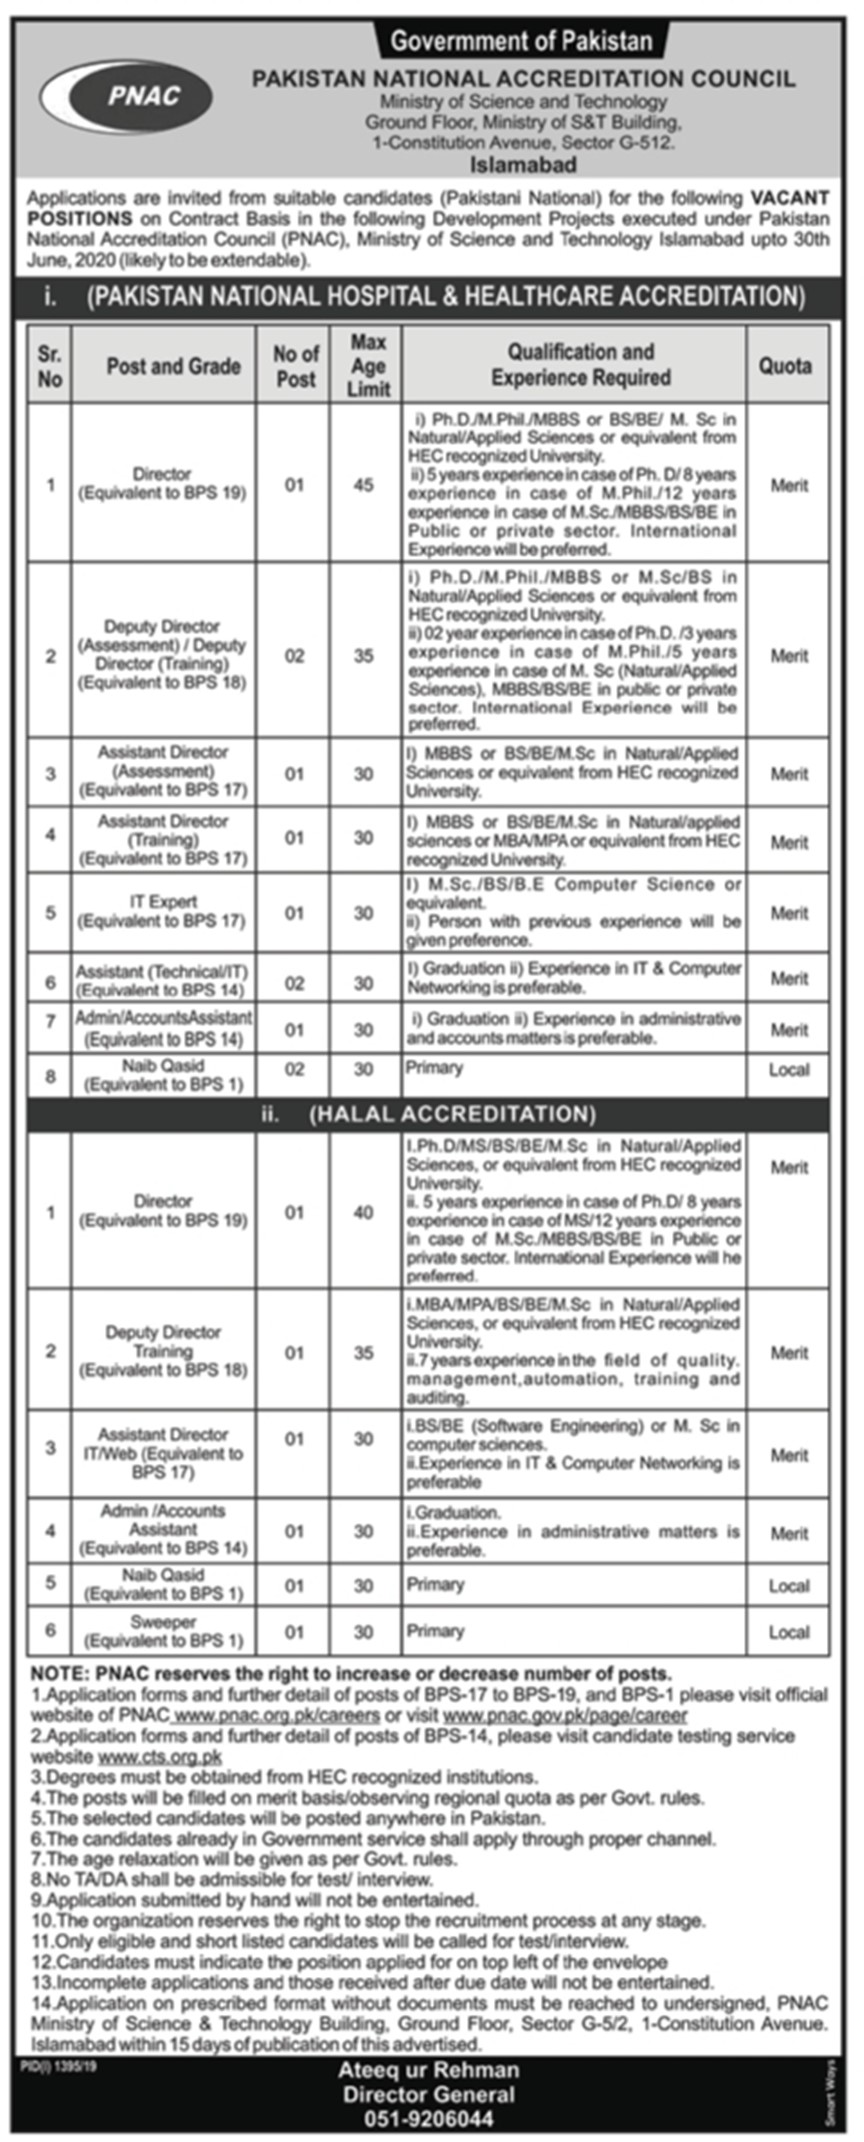 PNAC Pakistan National Accreditation Council Jobs 2019 CTS Application Form Roll No Slip